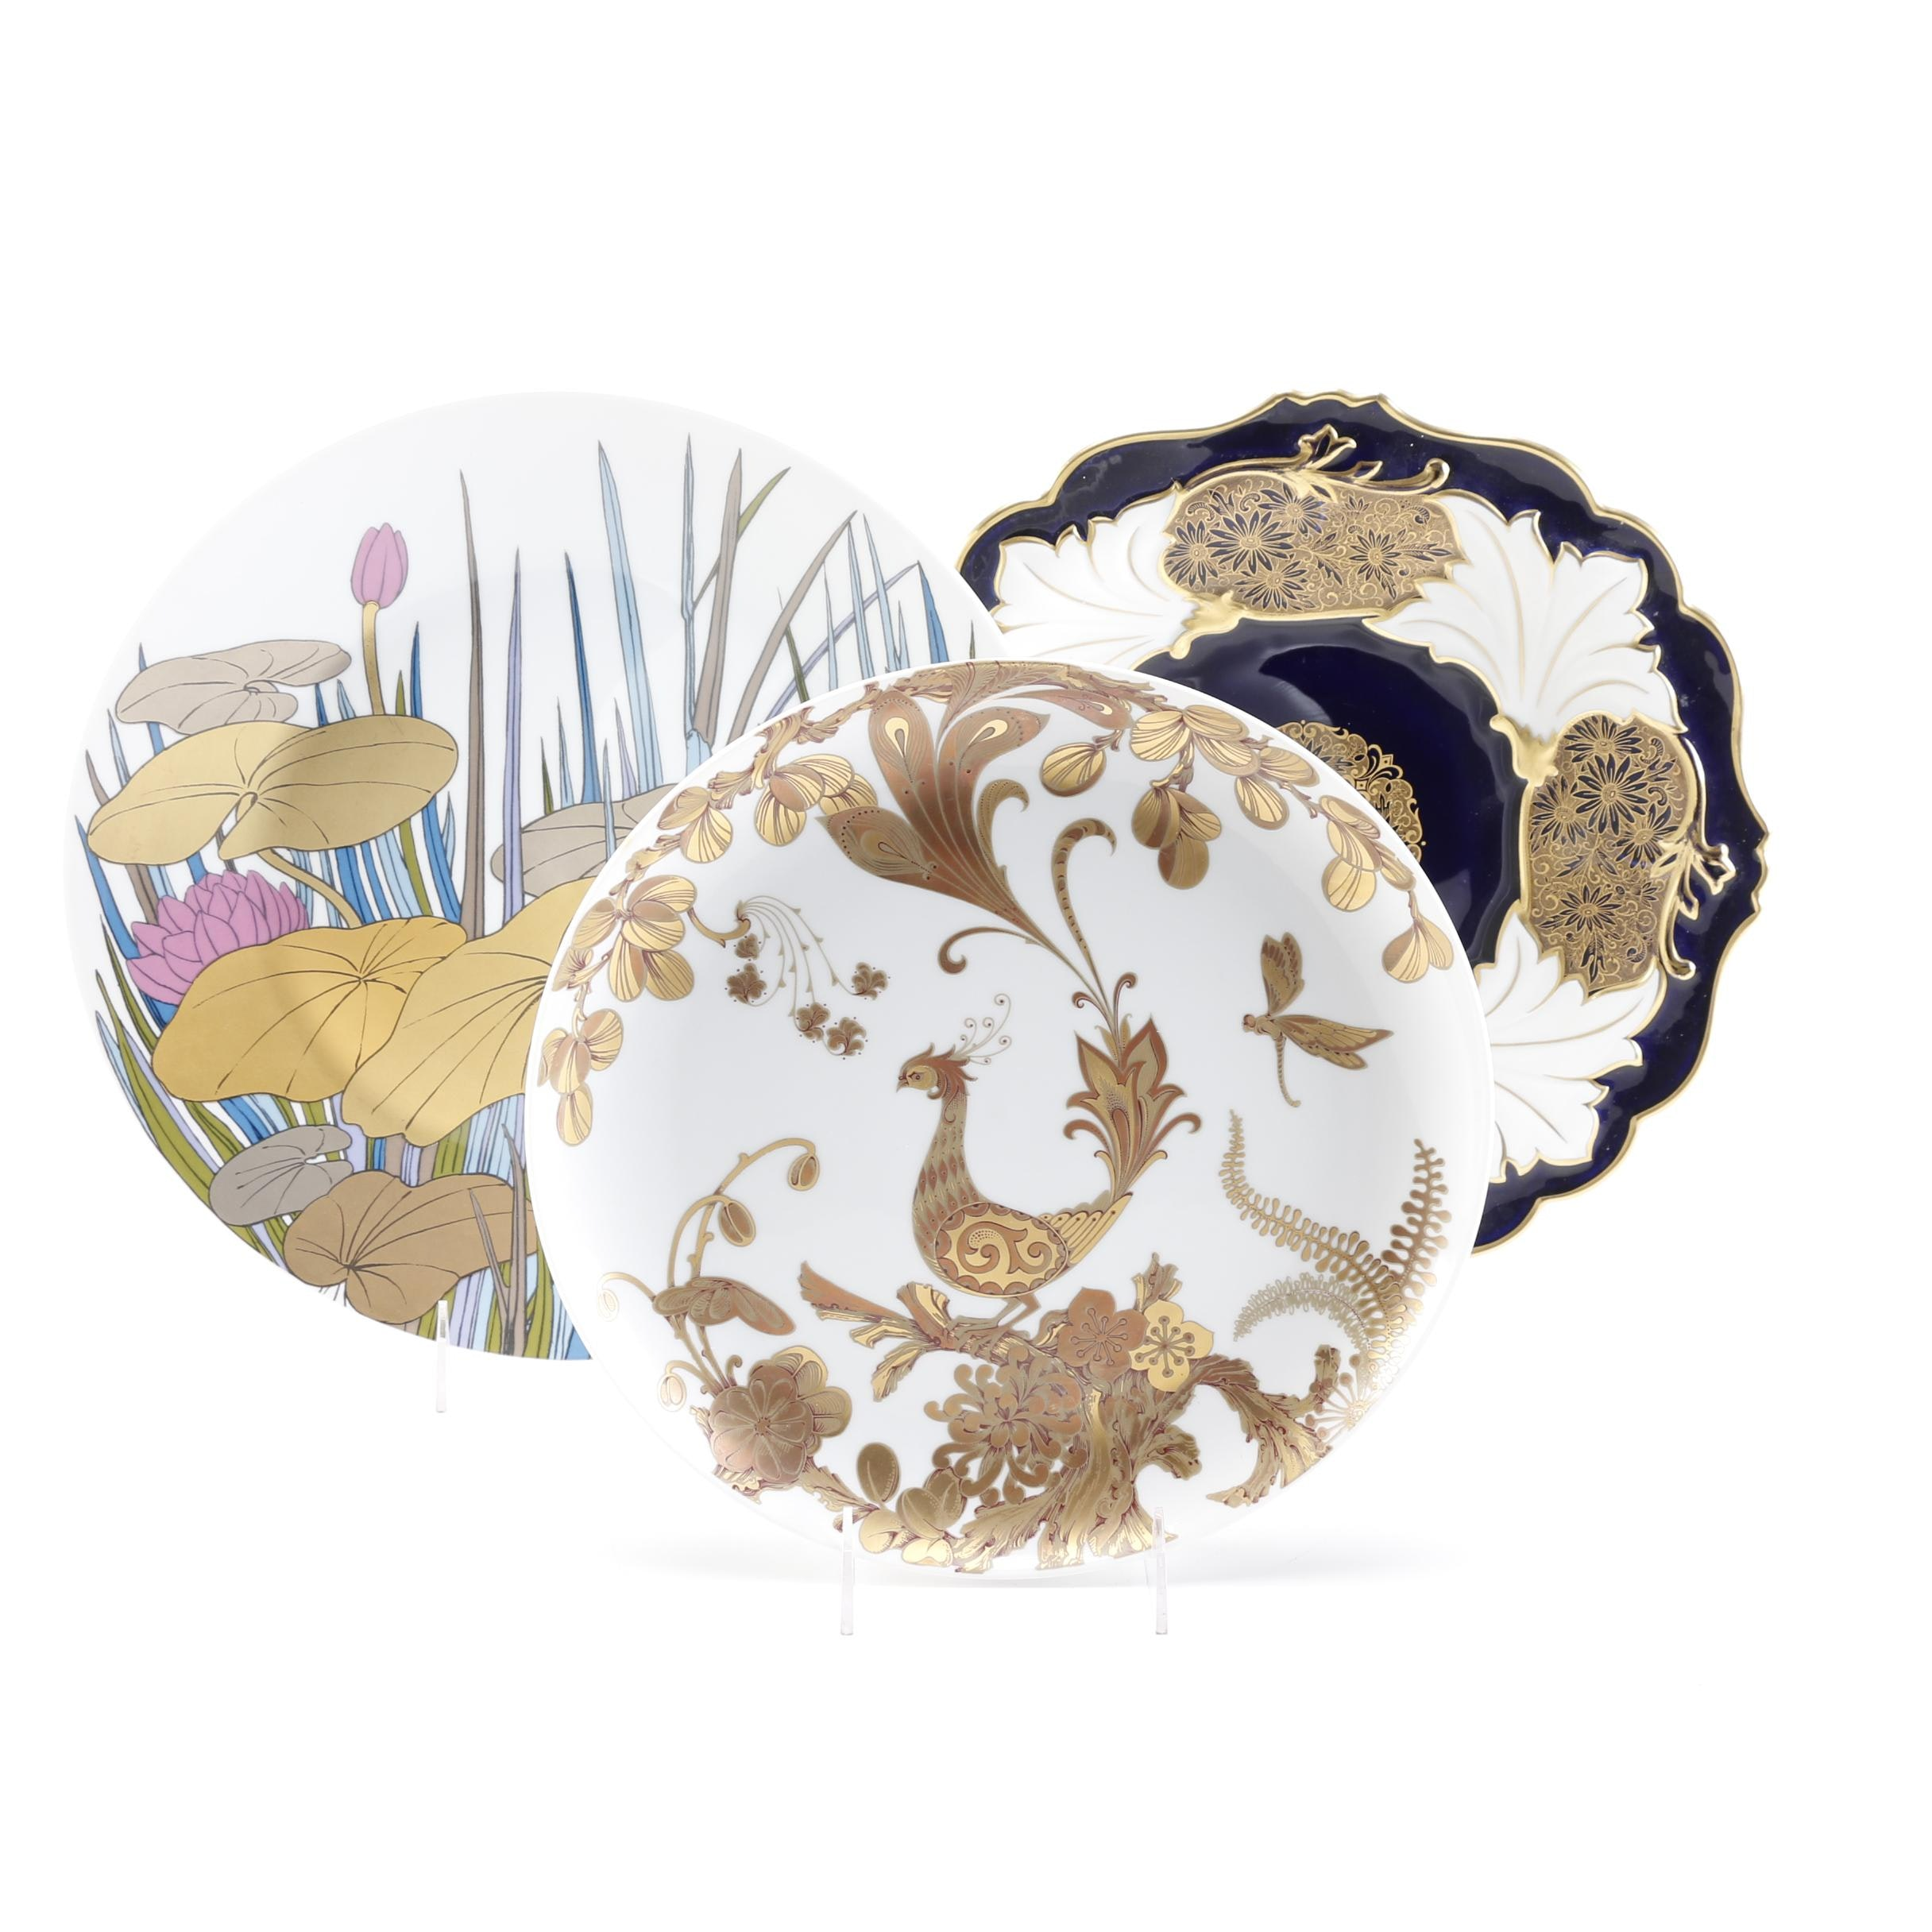 Decorative Plate Assortment Featuring Rosenthal